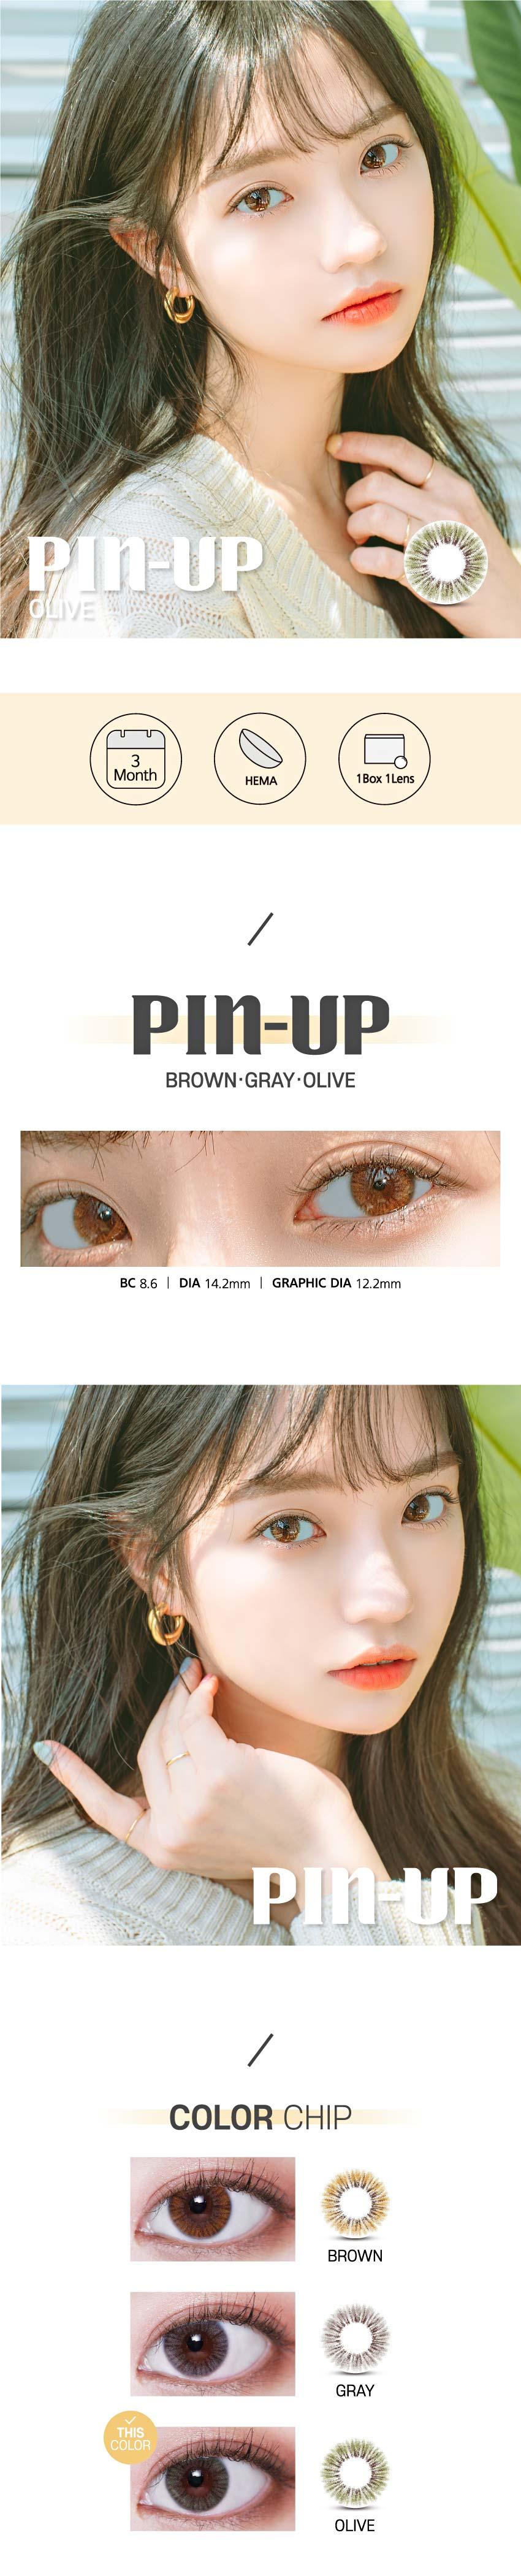 pin-up-olive-korean-circle-lenses1.jpg